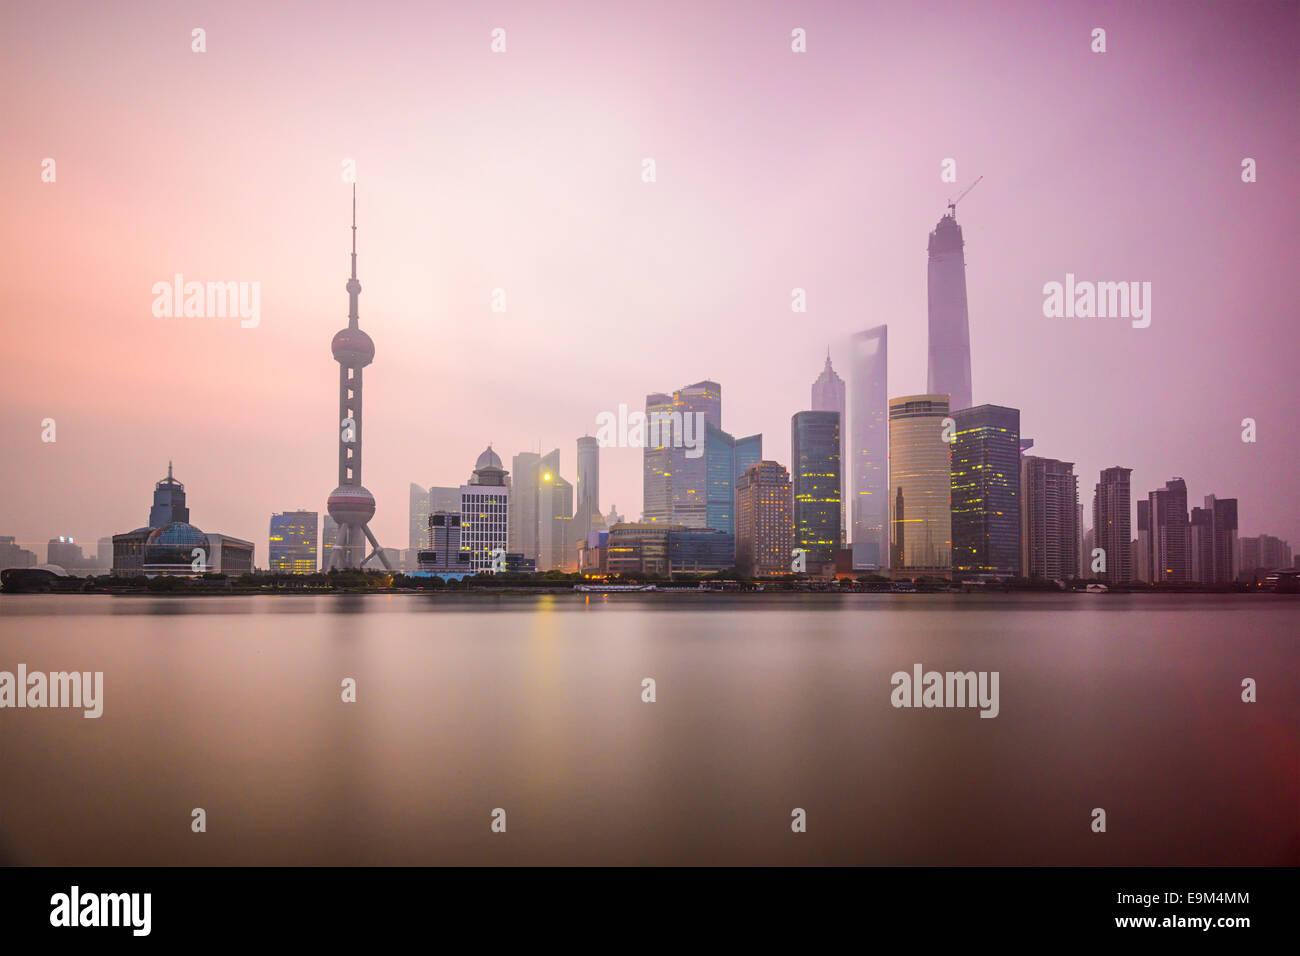 Shanghai, China city skyline on the Huangpu River. Stock Photo